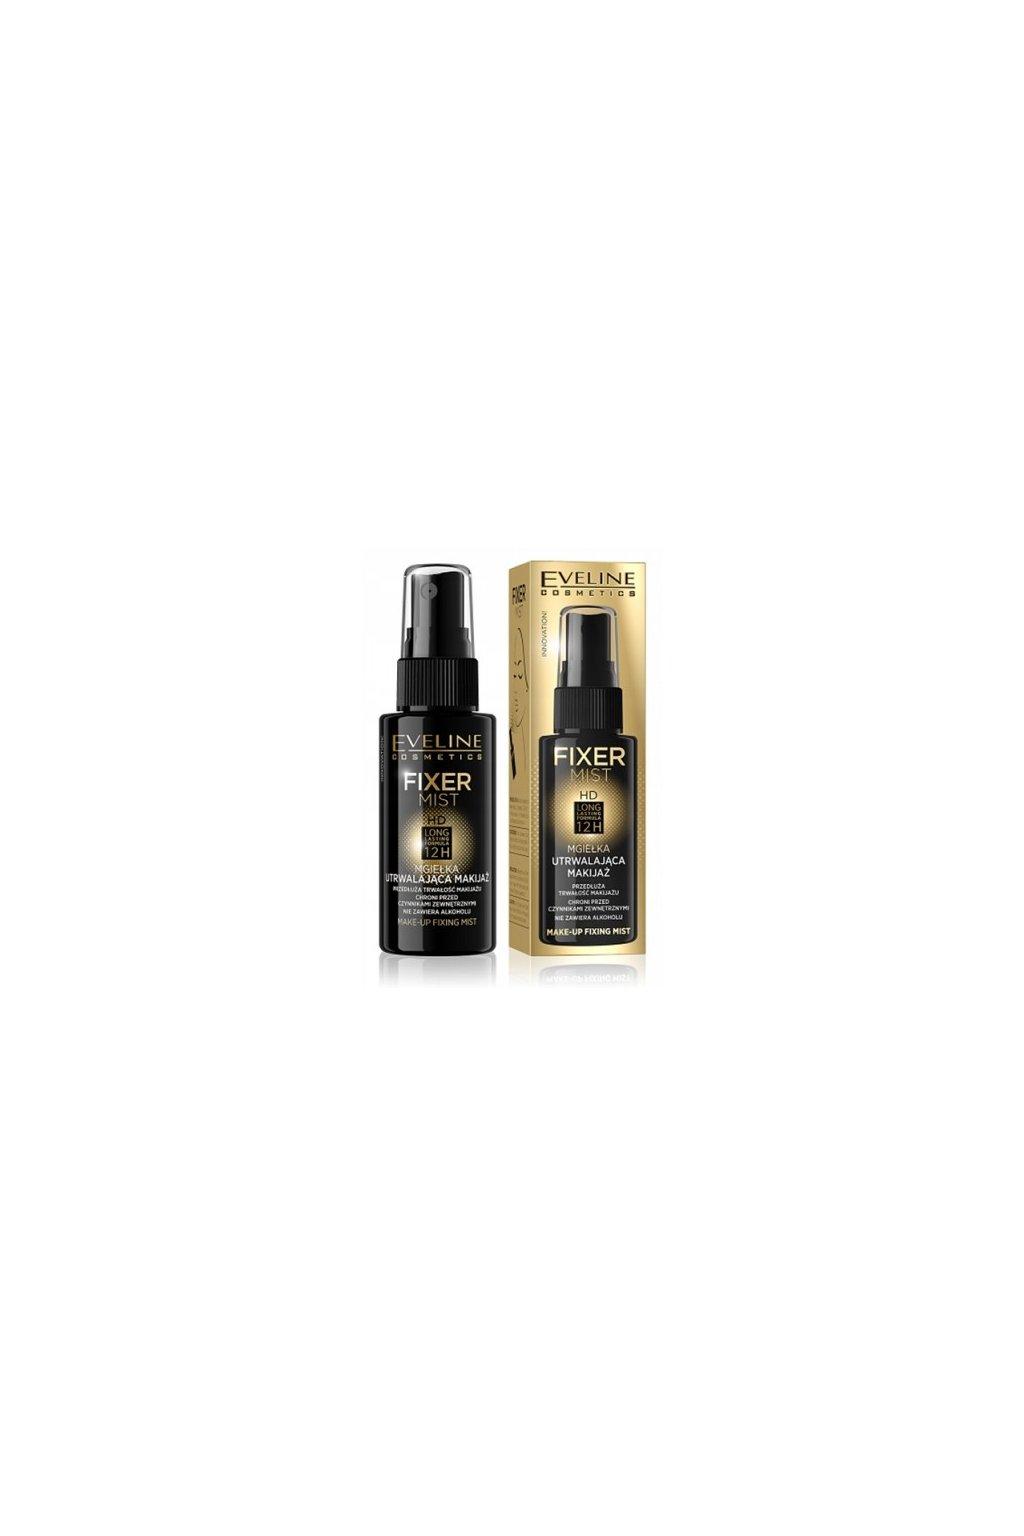 eveline cosmetics fixer mist hd lasting 12h 50 ml